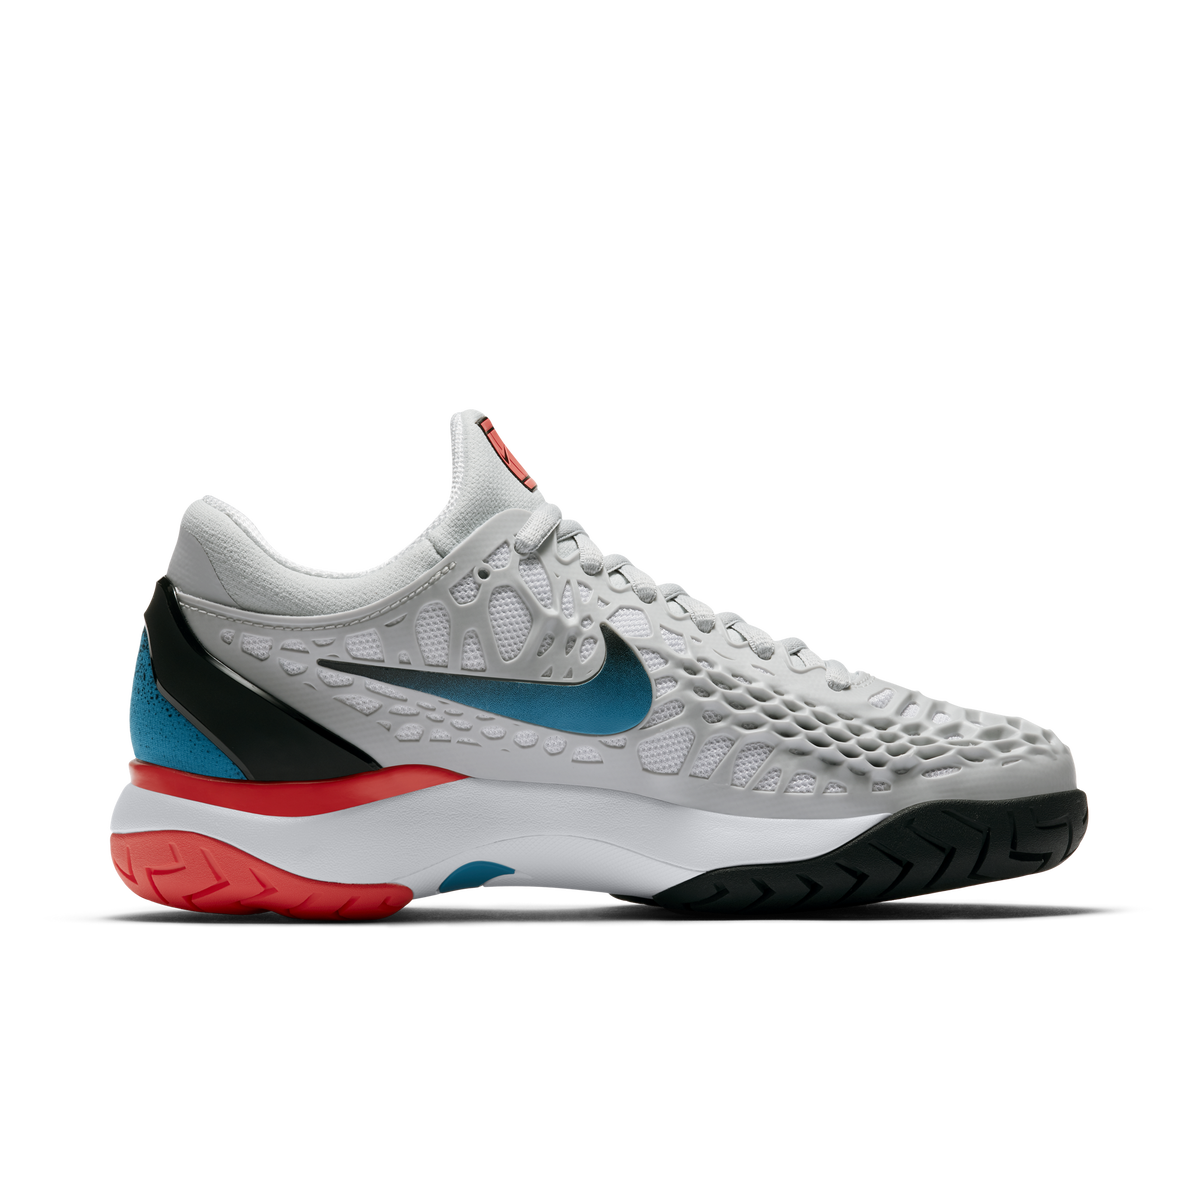 eb413ade3914 Nike Zoom Cage 3 Women's Tennis Shoe - Light Grey | PGA TOUR Superstore